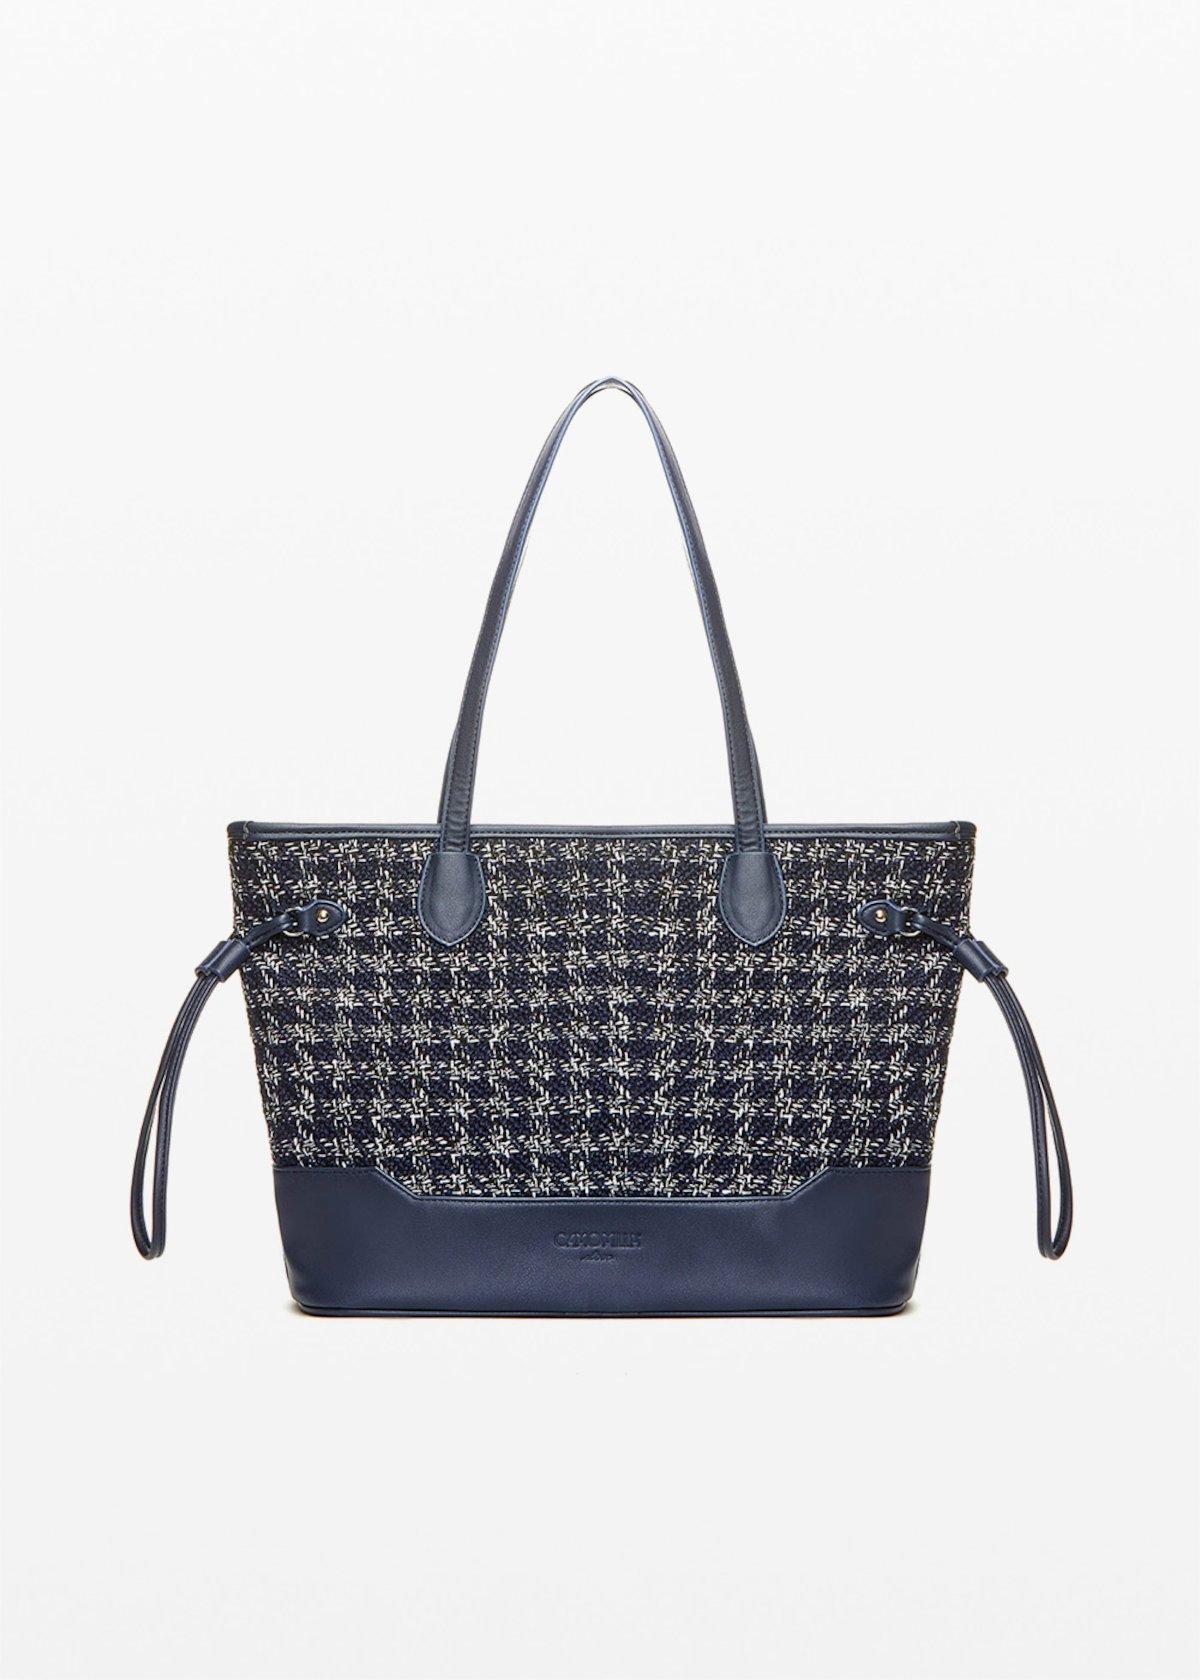 Shopping bag Beta boucle' effect - Blue / White Fantasia - Donna - Immagine categoria